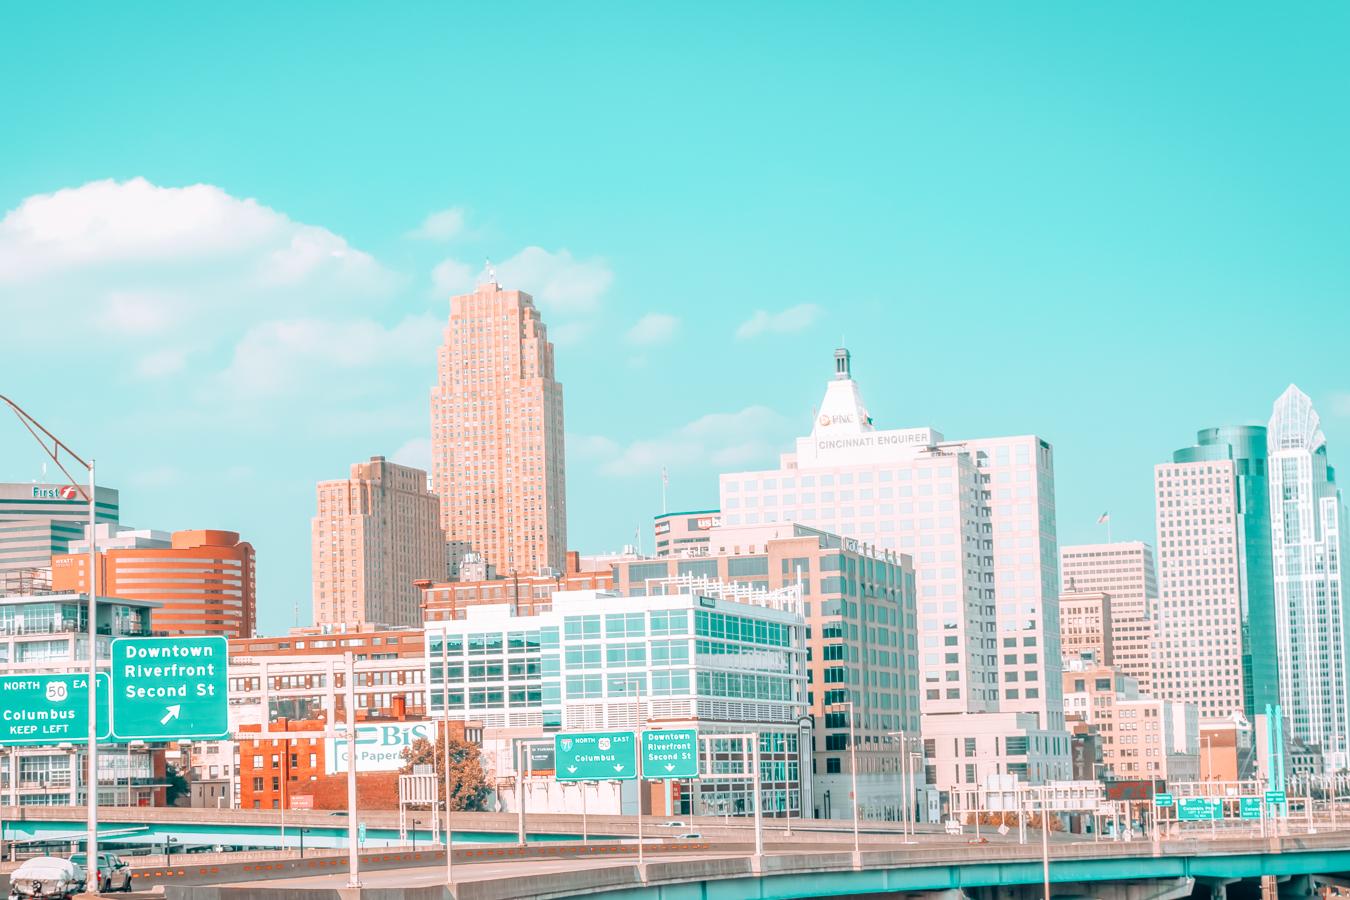 Buildings in Cincinnati